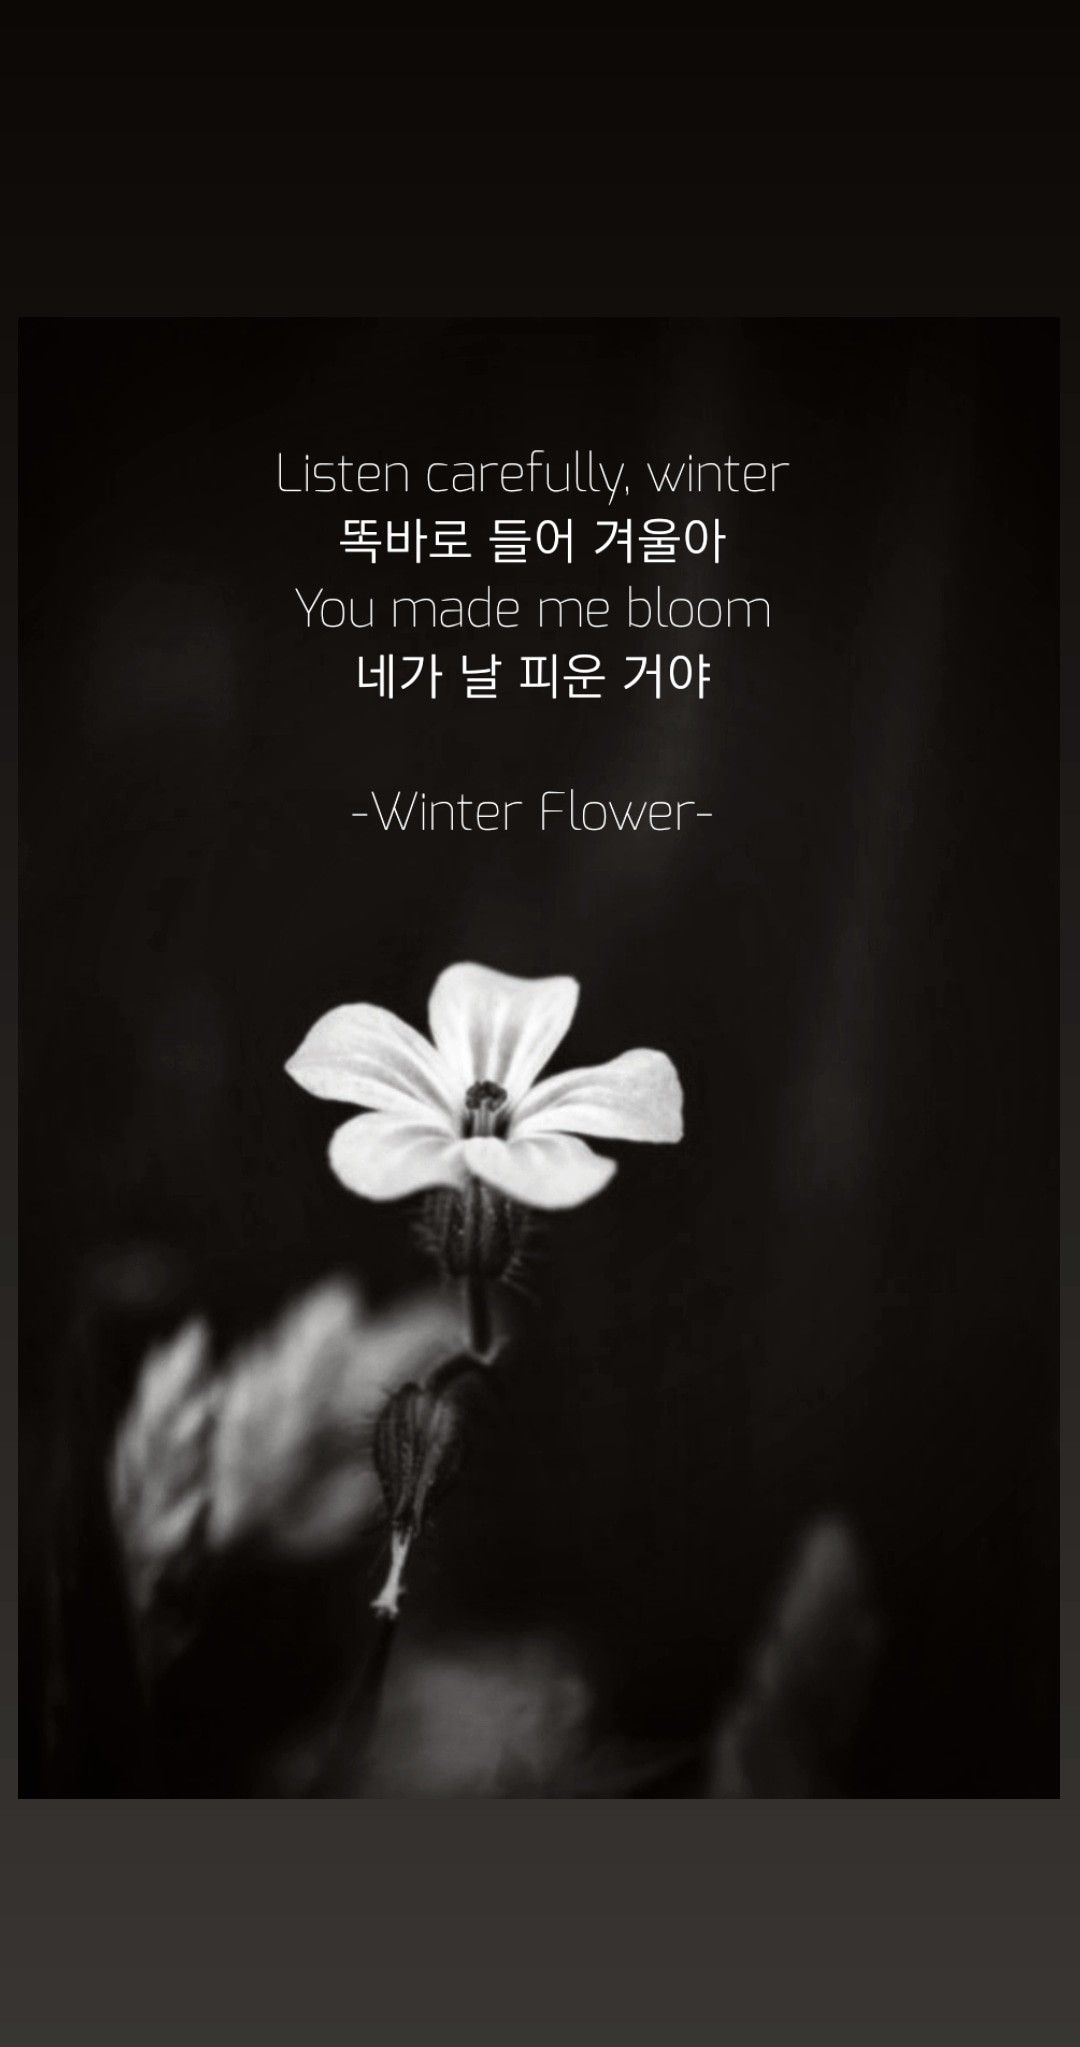 Winter Flower Lyrics In 2020 Flower Lyrics Winter Flowers Beautiful Words